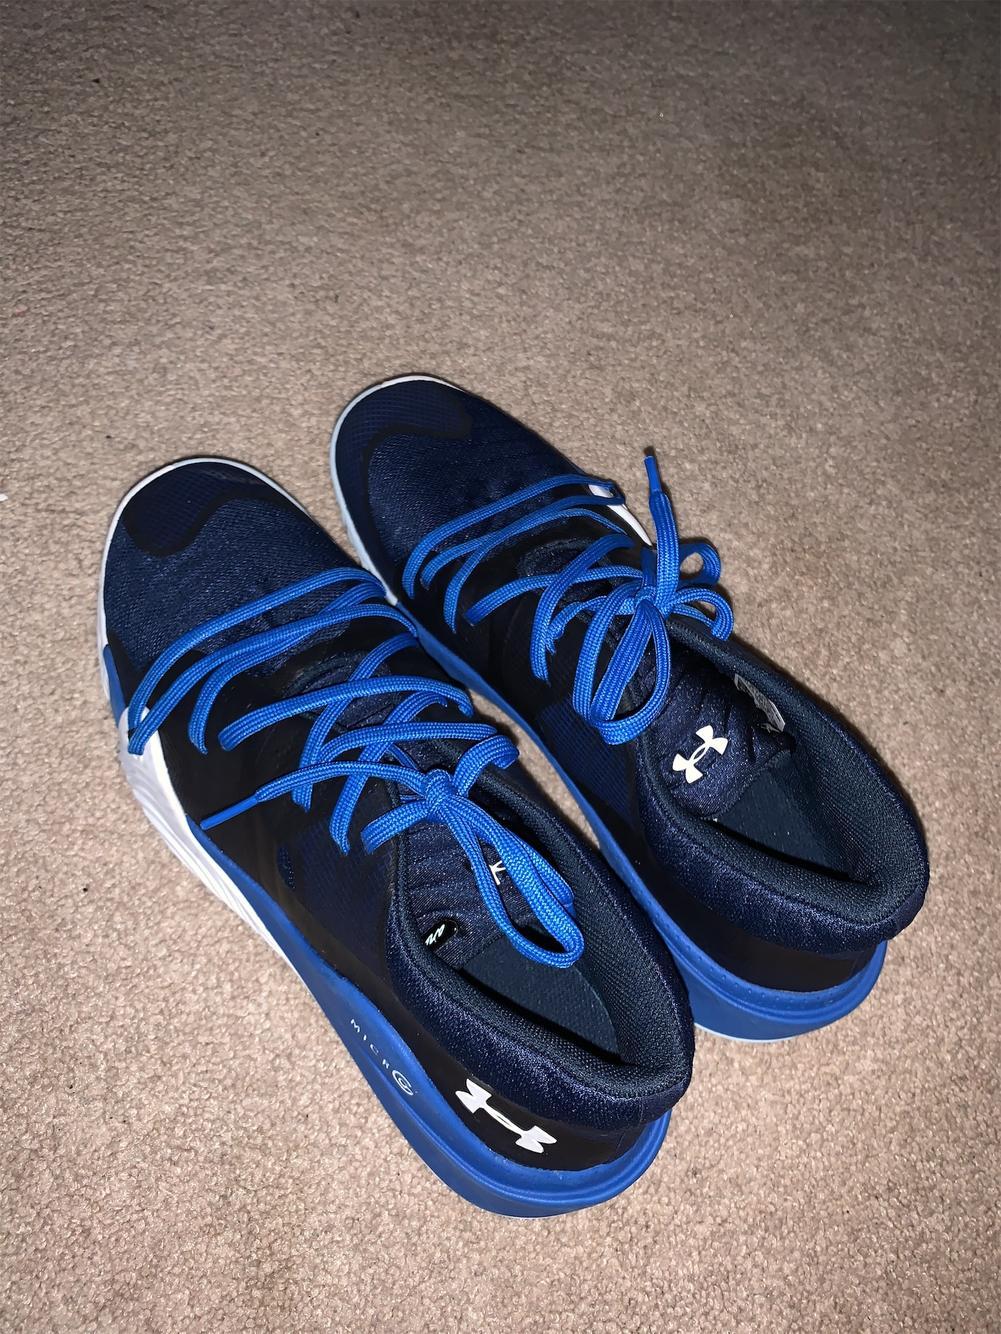 Size Men's 10.5 (W 11.5) | Basketball Shoes